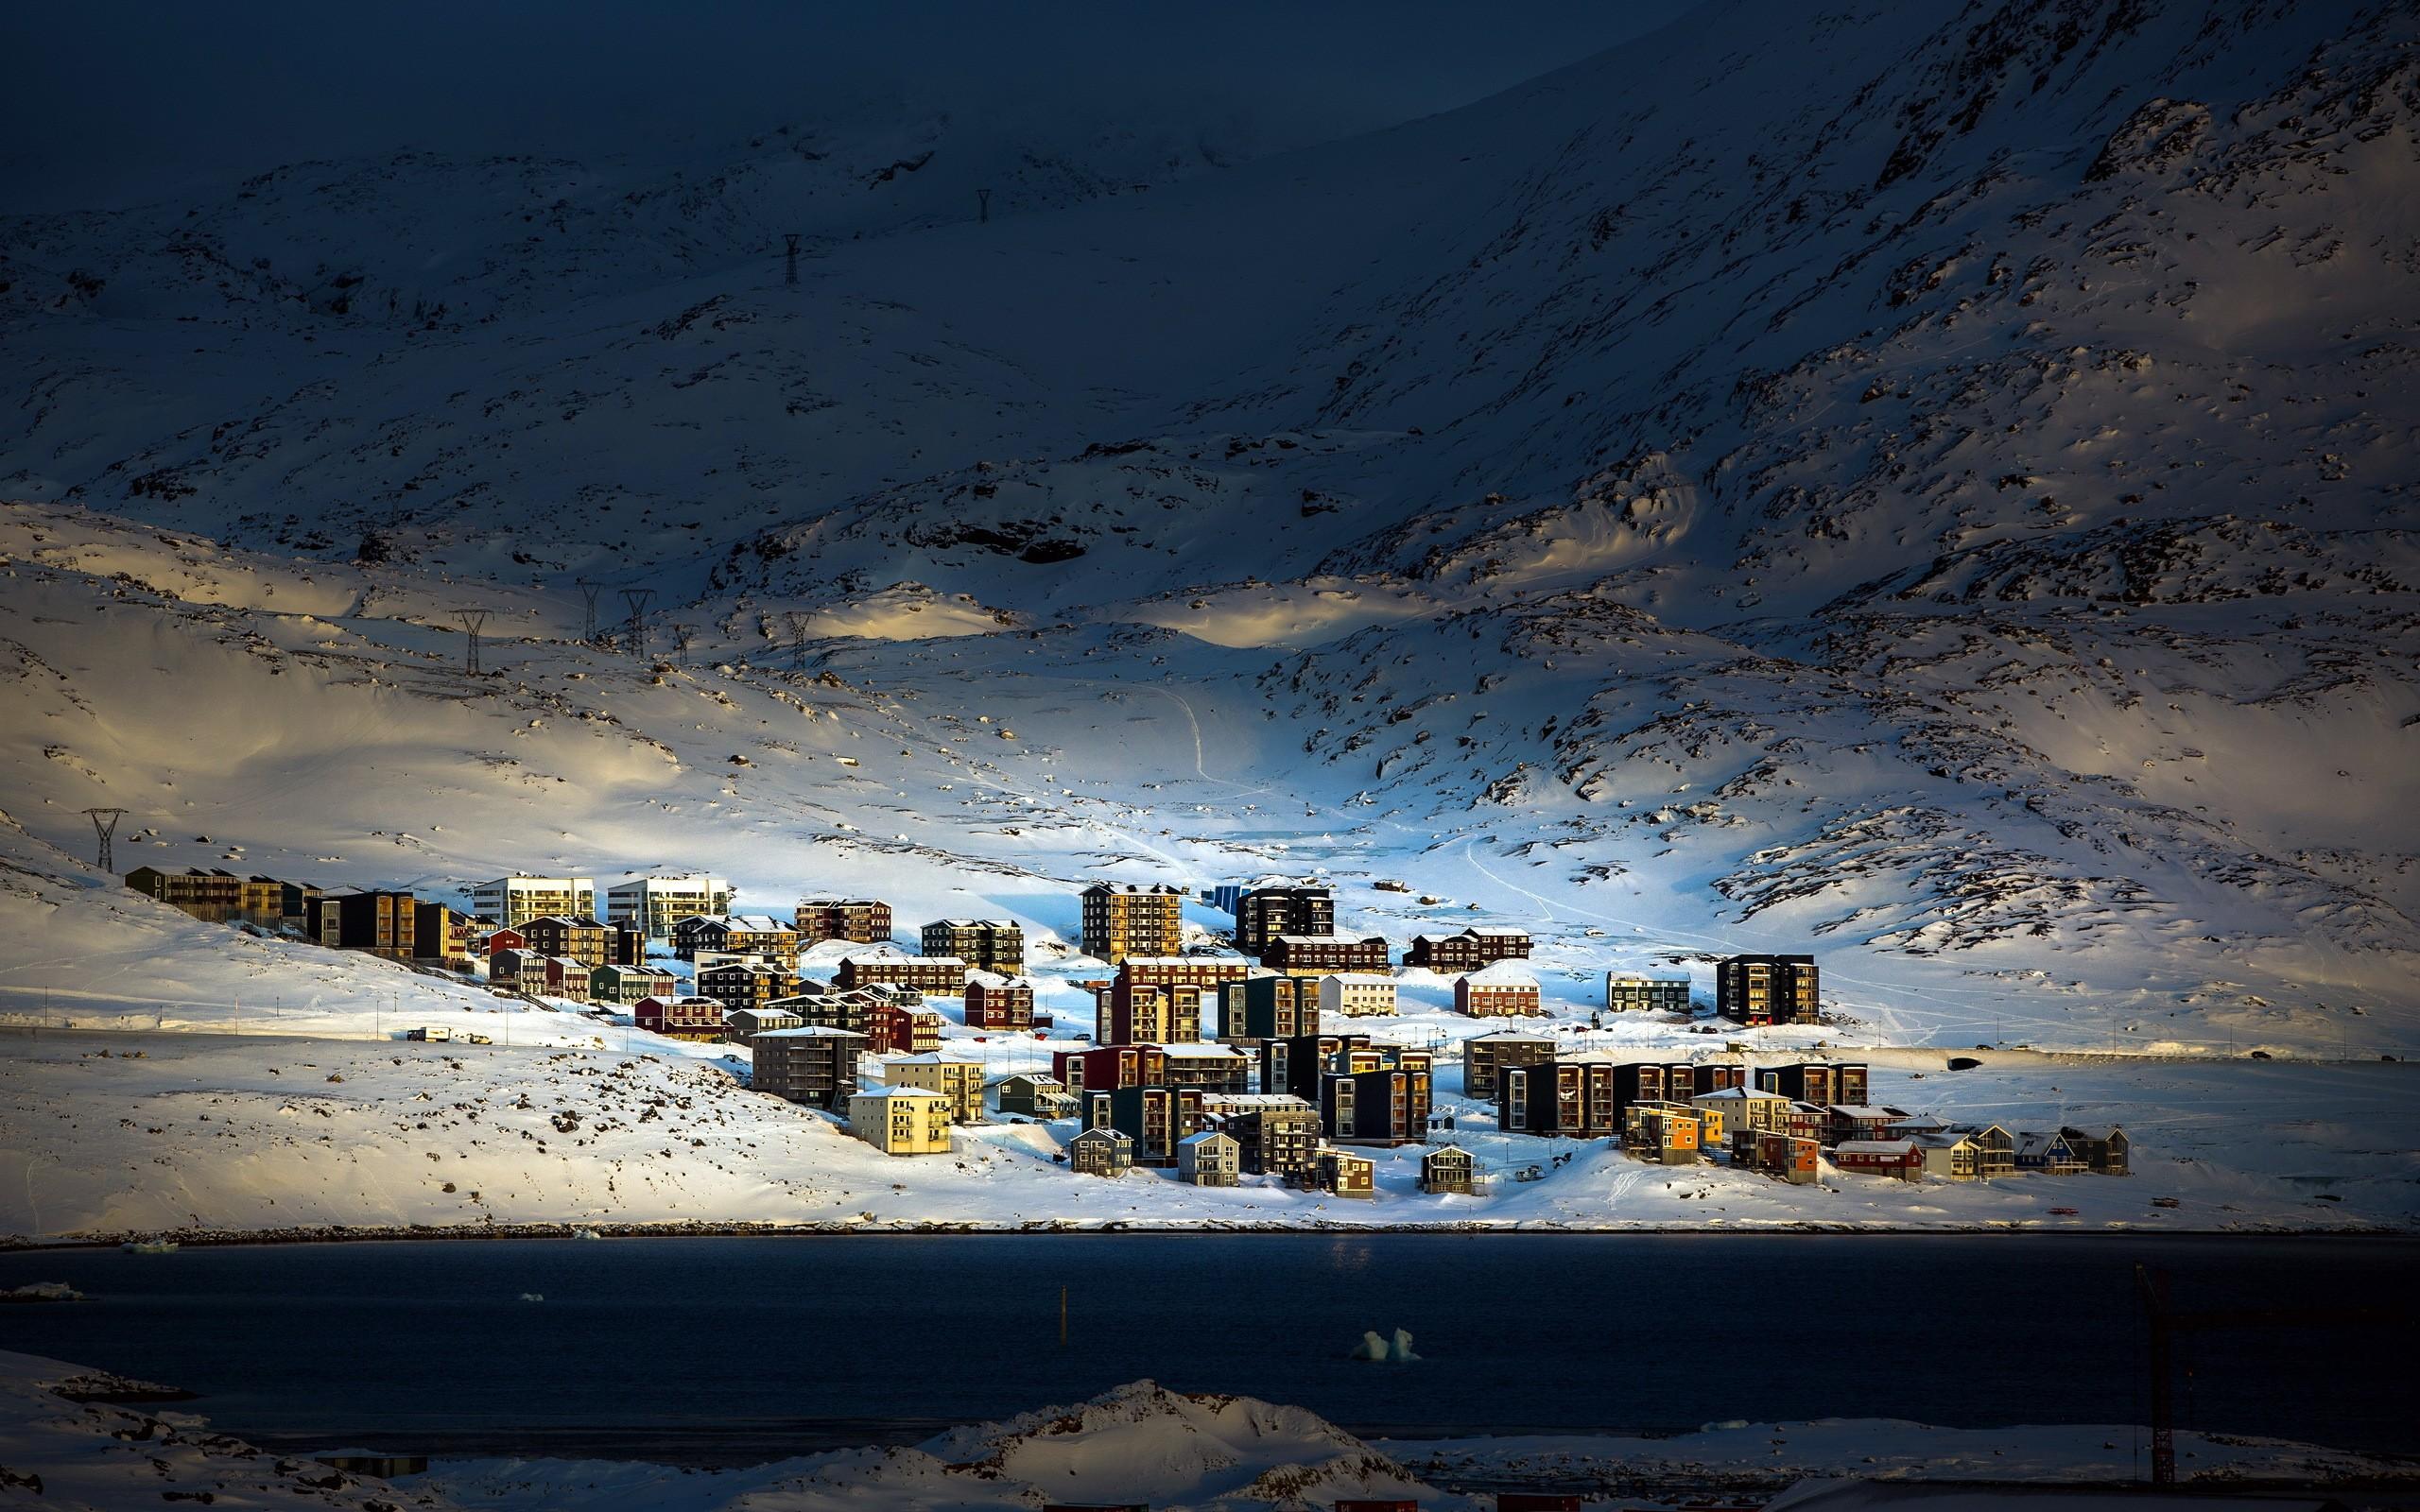 Wallpaper : landscape, night, reflection, snow, winter, ice